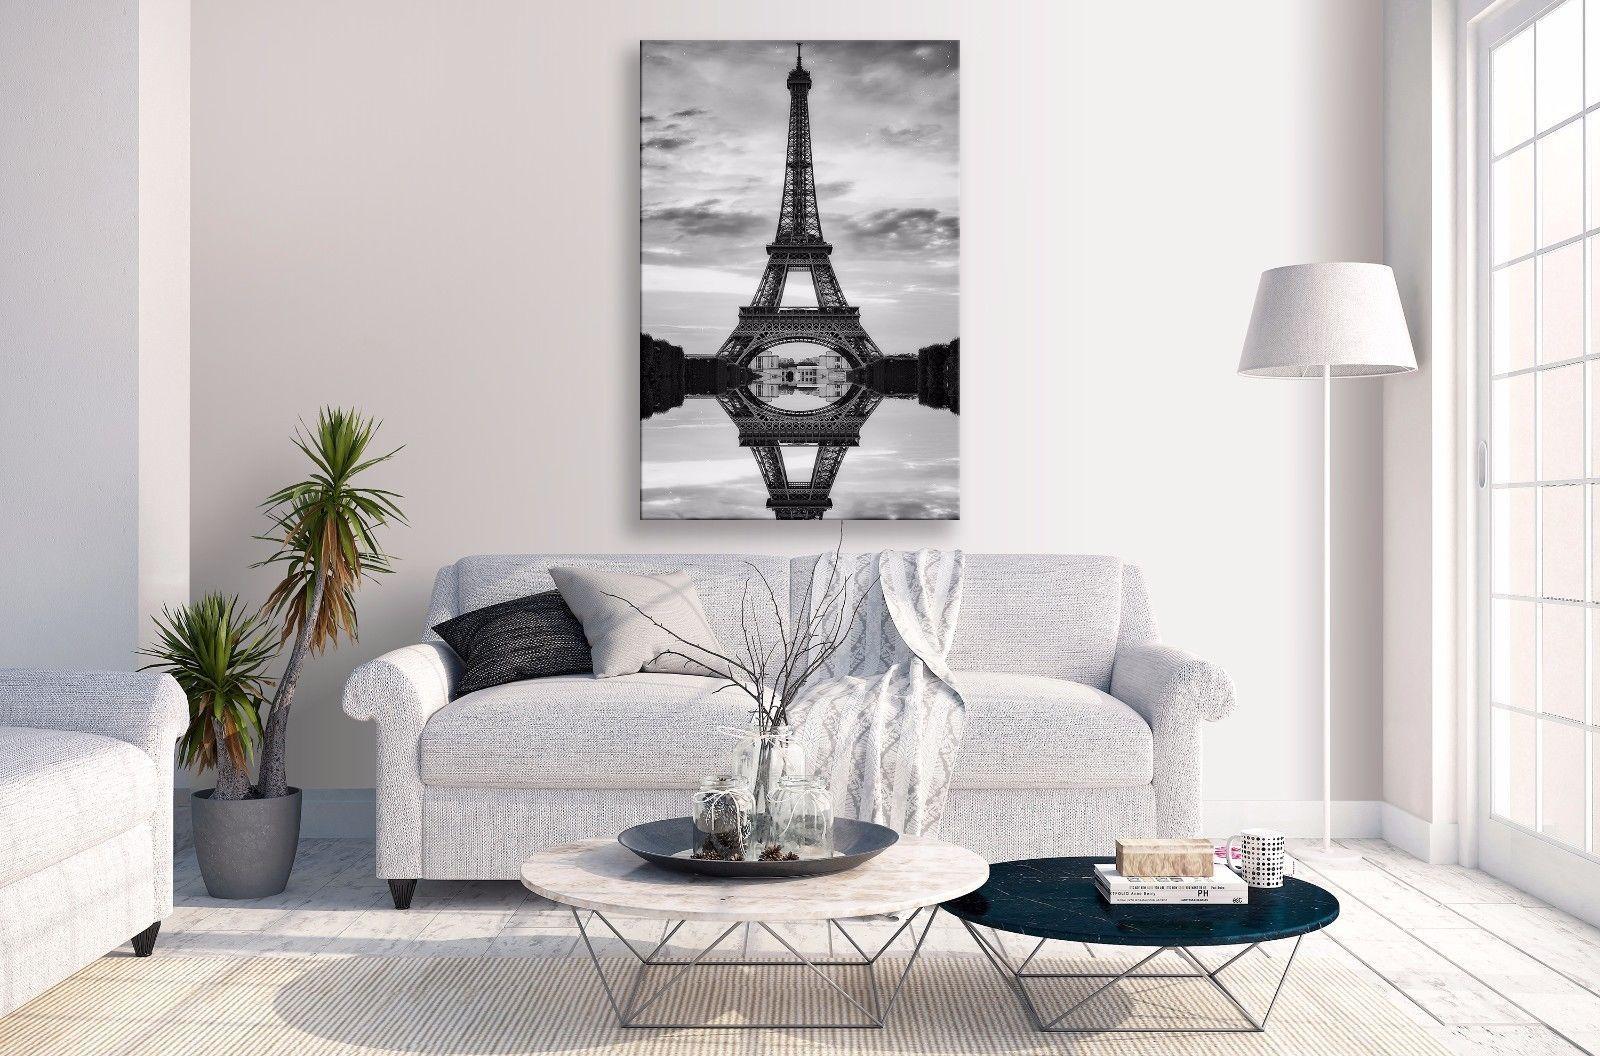 Eiffel tower canvas sunset reflection black portrait wall art